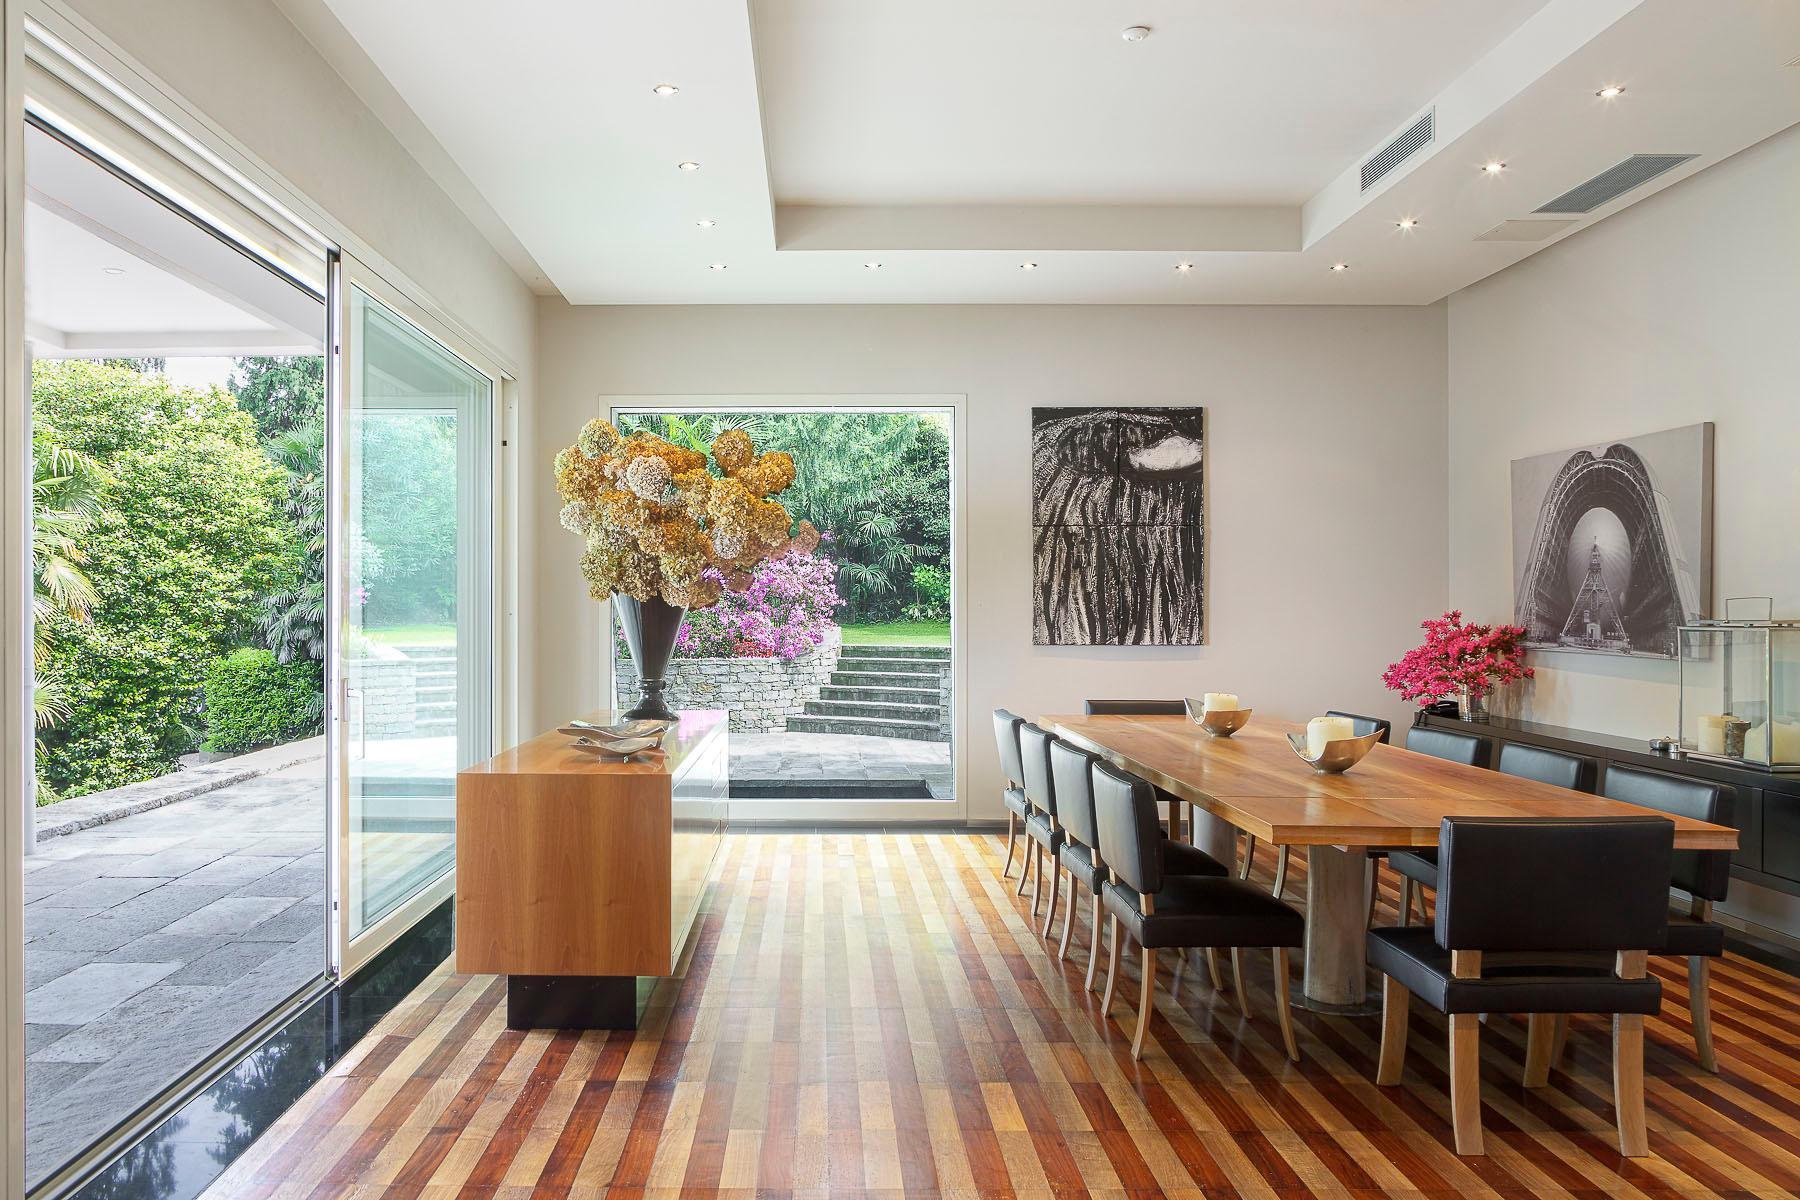 Architettura, stile e fascino a Stresa - 18